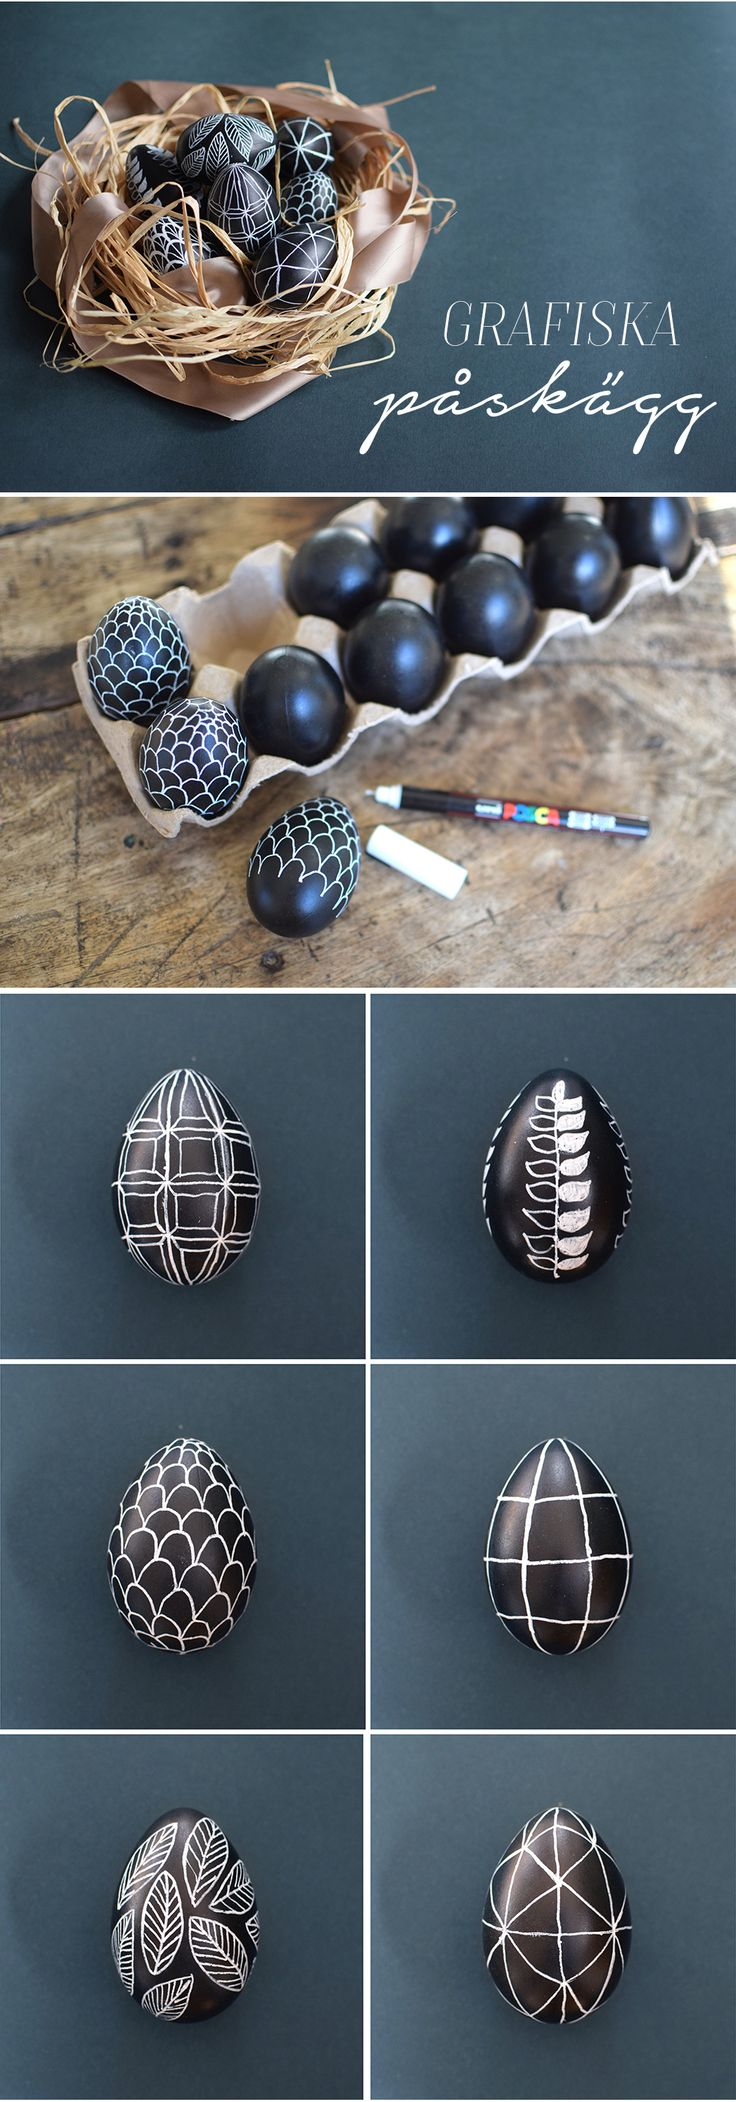 Påskpyssel, rita på påskägg. Eastercrafts, draw graphic patterns on eastereggs, easter diy @helenalyth